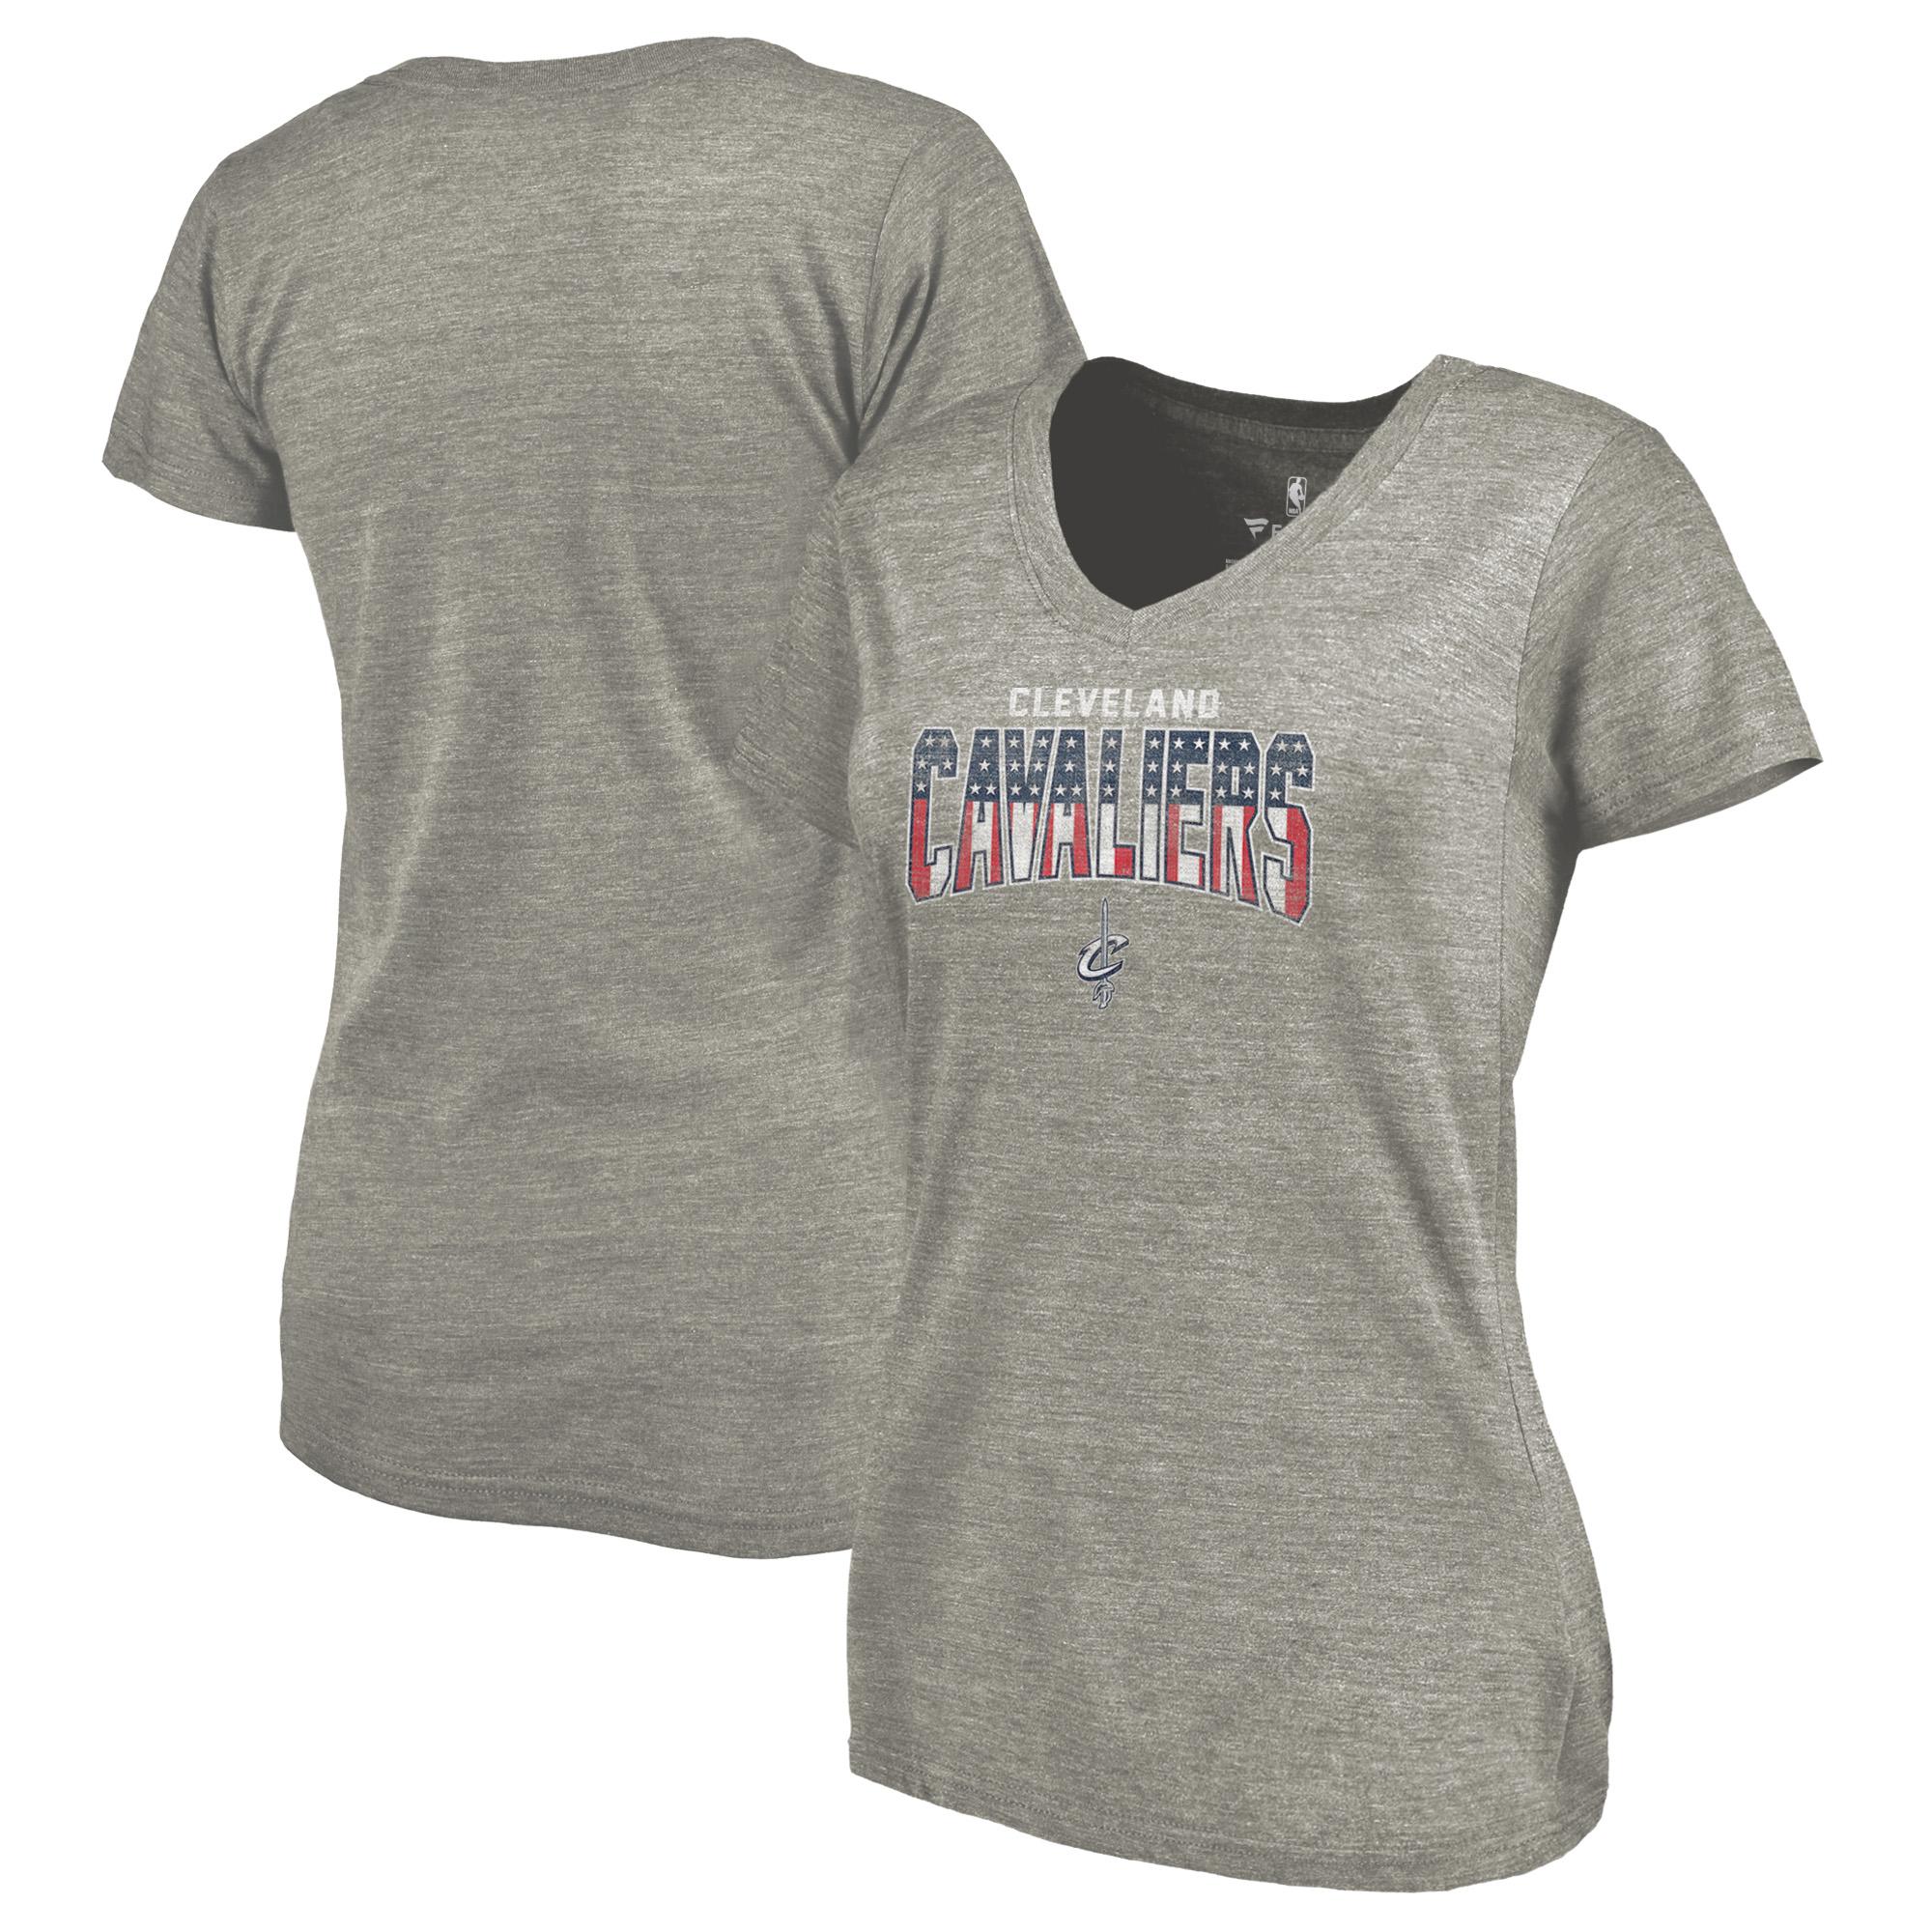 Cleveland Cavaliers Fanatics Branded Women's Freedom V-Neck Tri-Blend T-Shirt - Heathered Gray